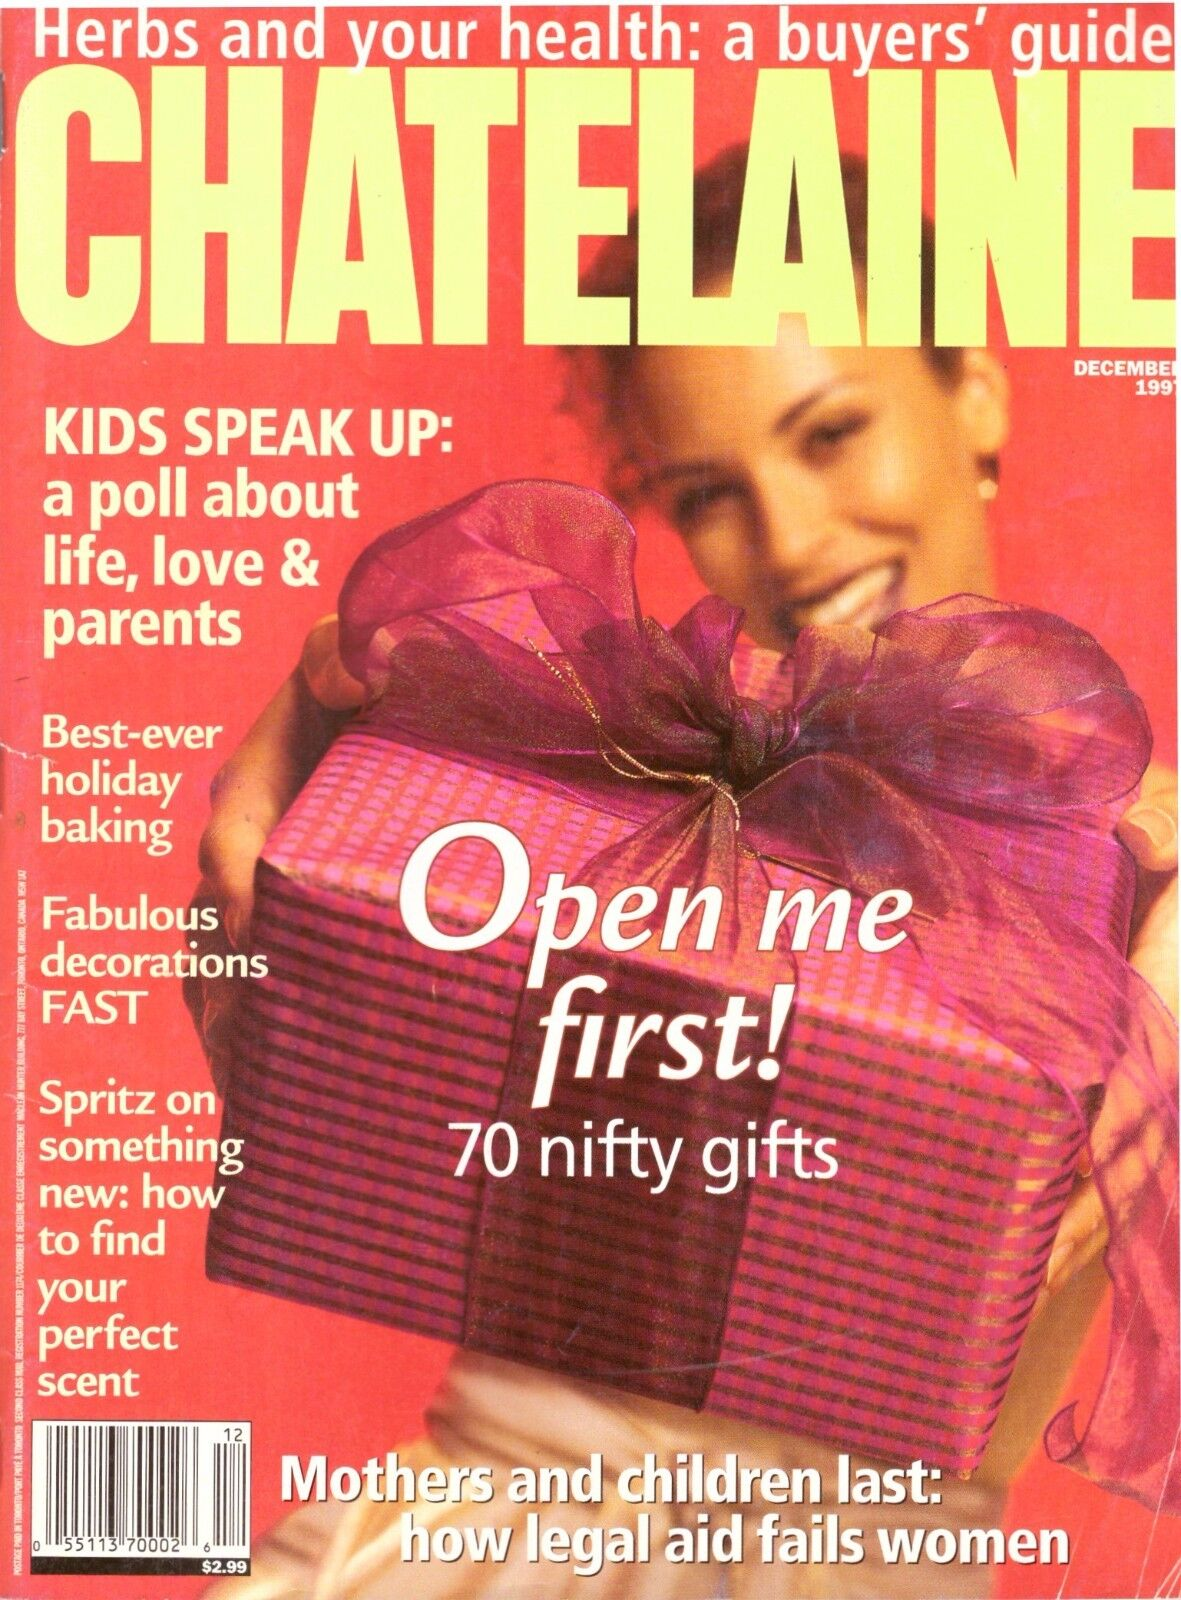 1997 Chatelaine Magazine Fashion Fitness Recipes Herbs Christmas Legal Aid 90s 1